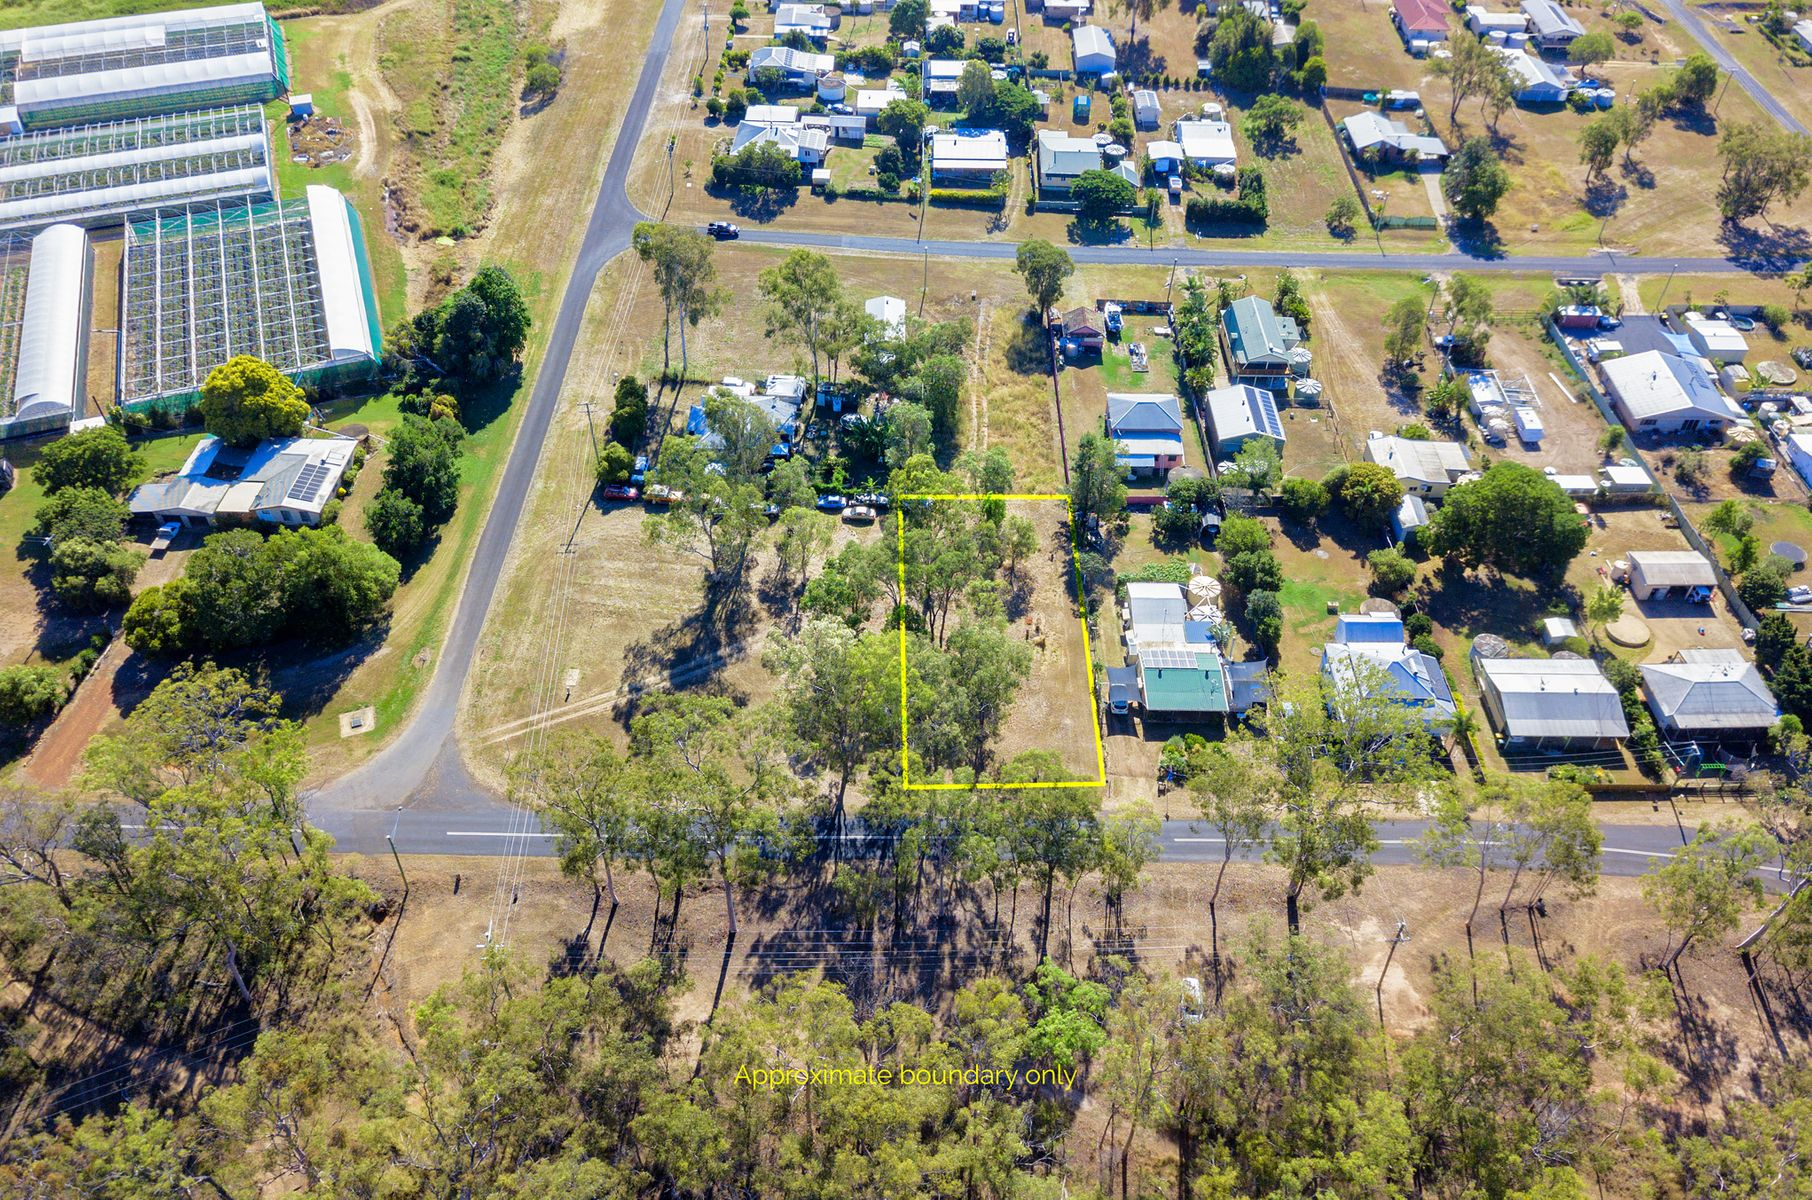 243 Avondale Road, Avondale, QLD 4670